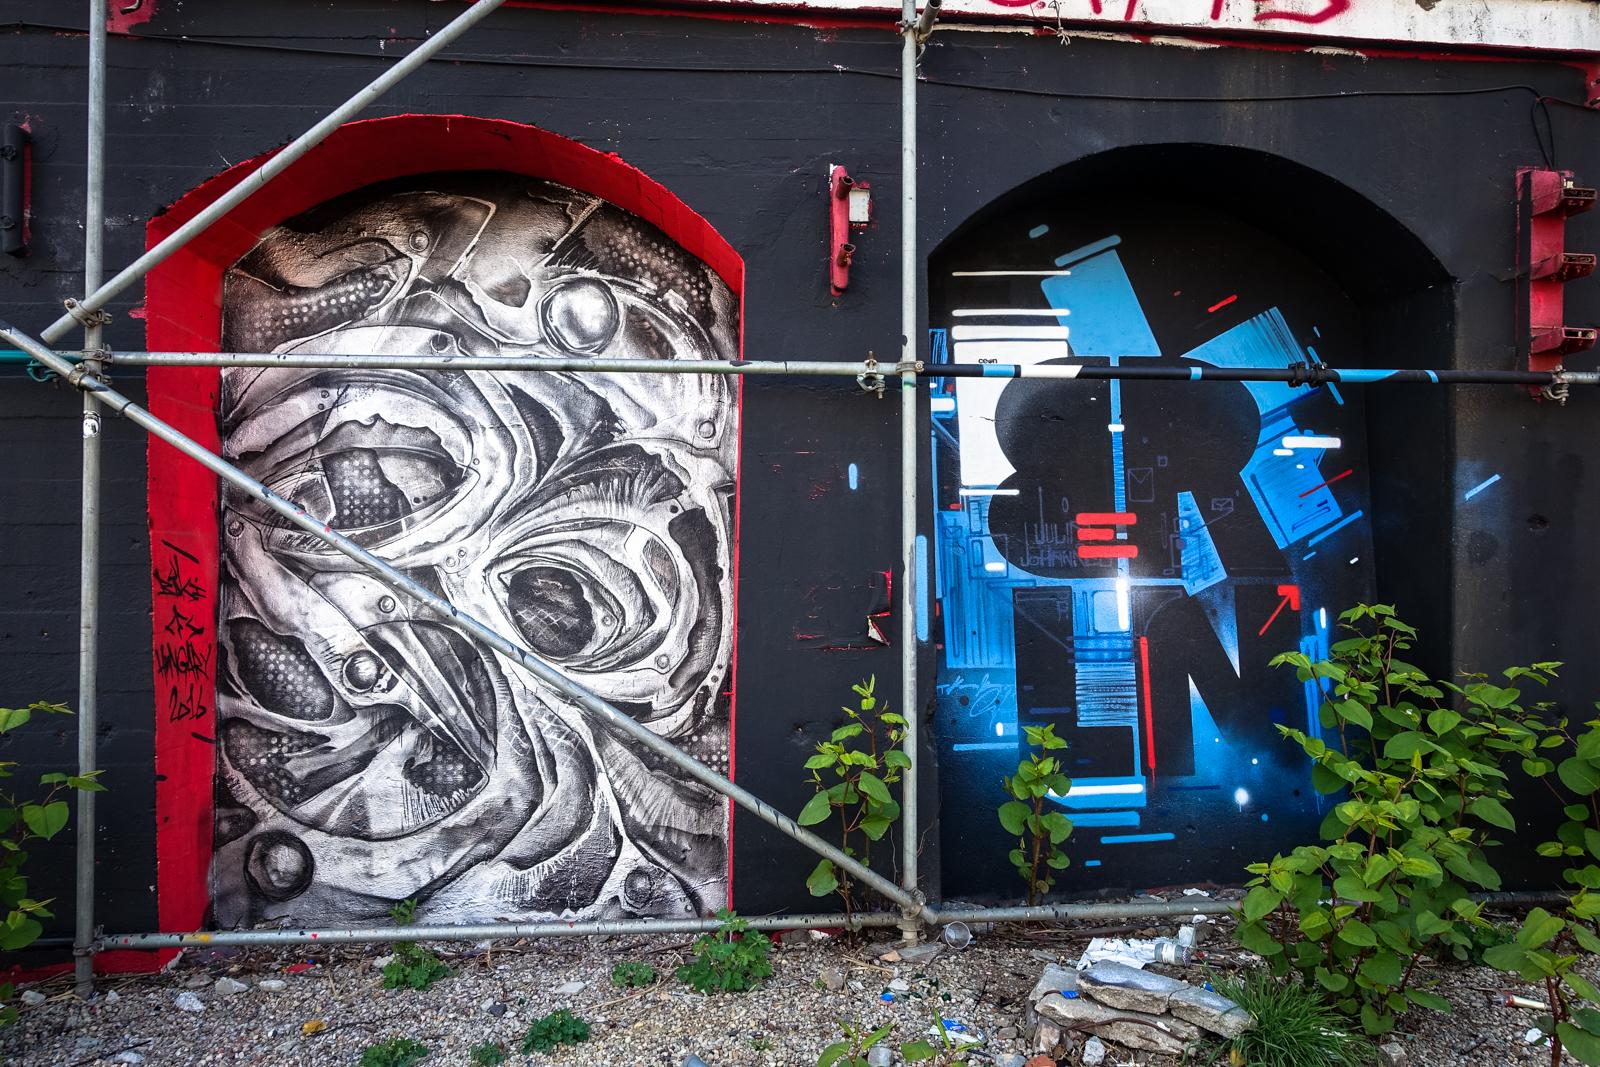 murals im urban spree garten mai 2016 urbanpresents. Black Bedroom Furniture Sets. Home Design Ideas